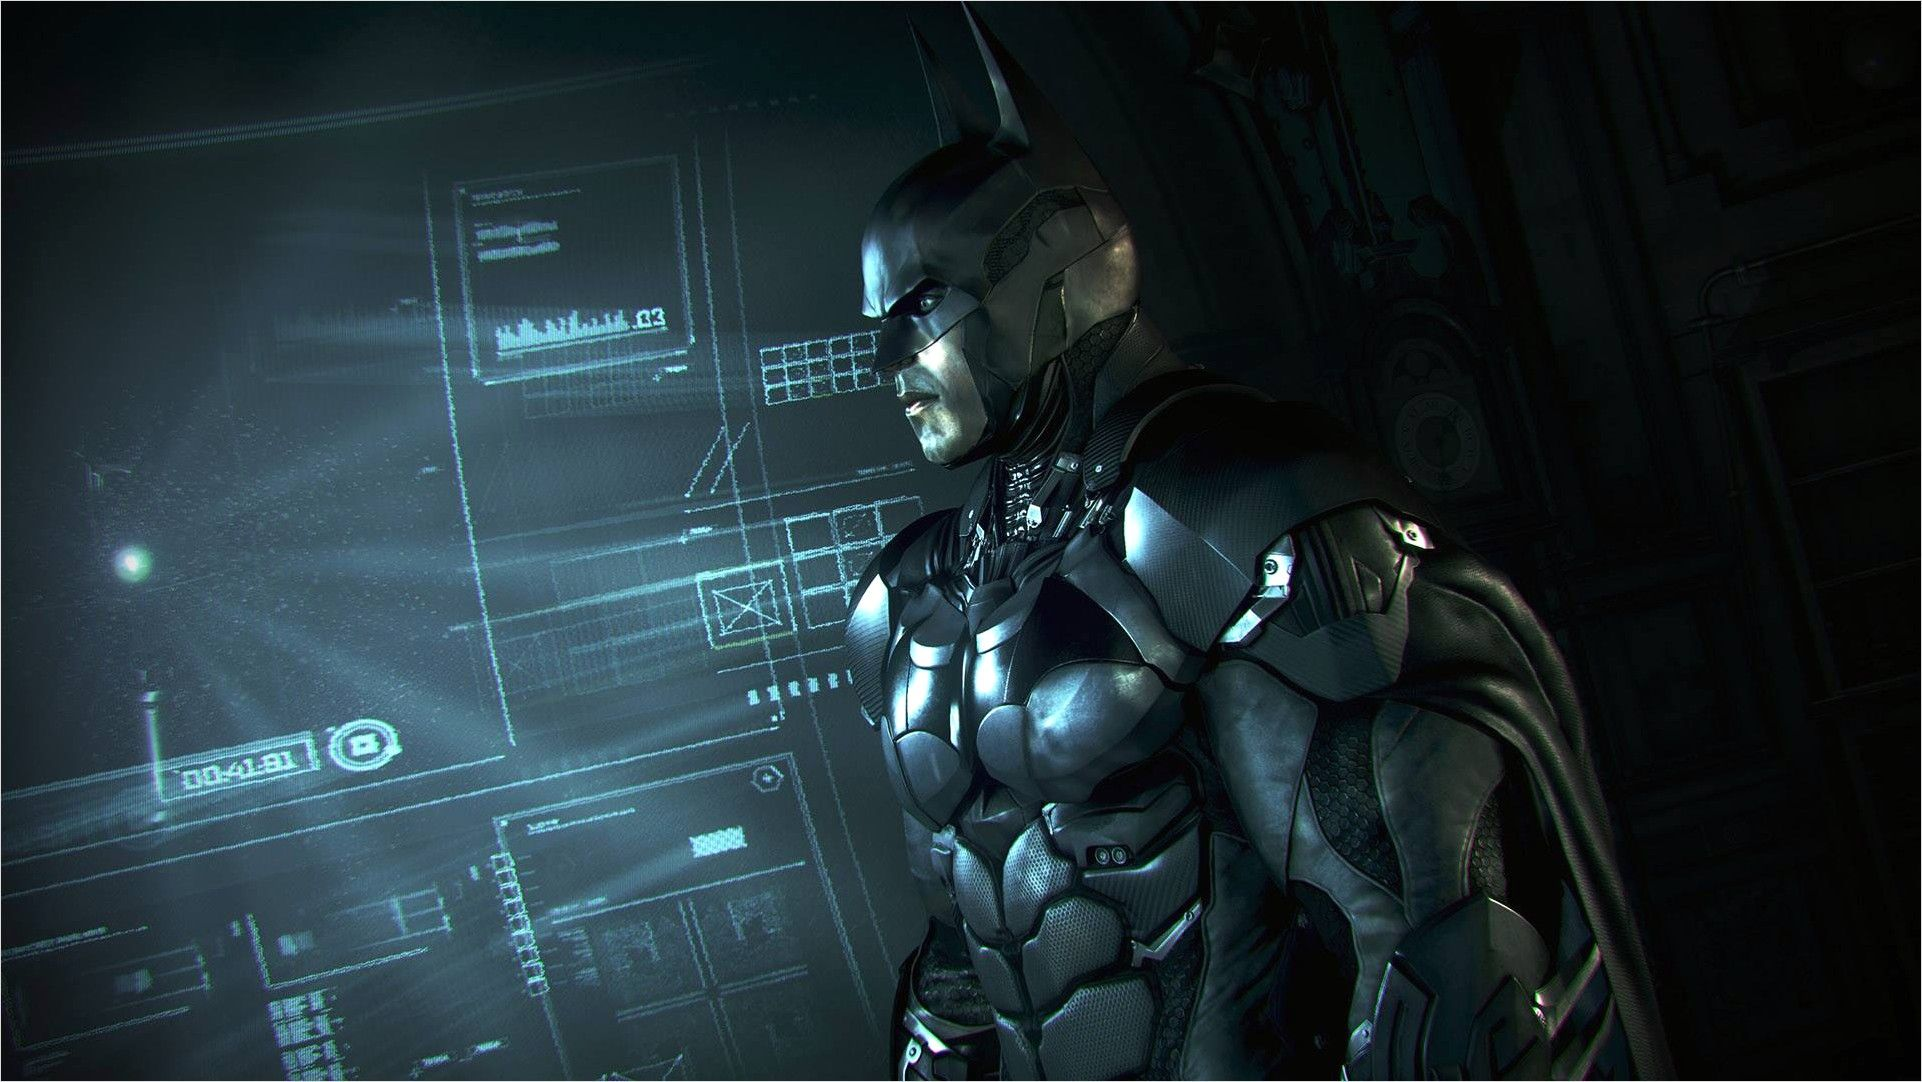 4k Animated Wallpaper Windows 10 In 2020 Arkham Knight Batman Arkham Batman Arkham Knight